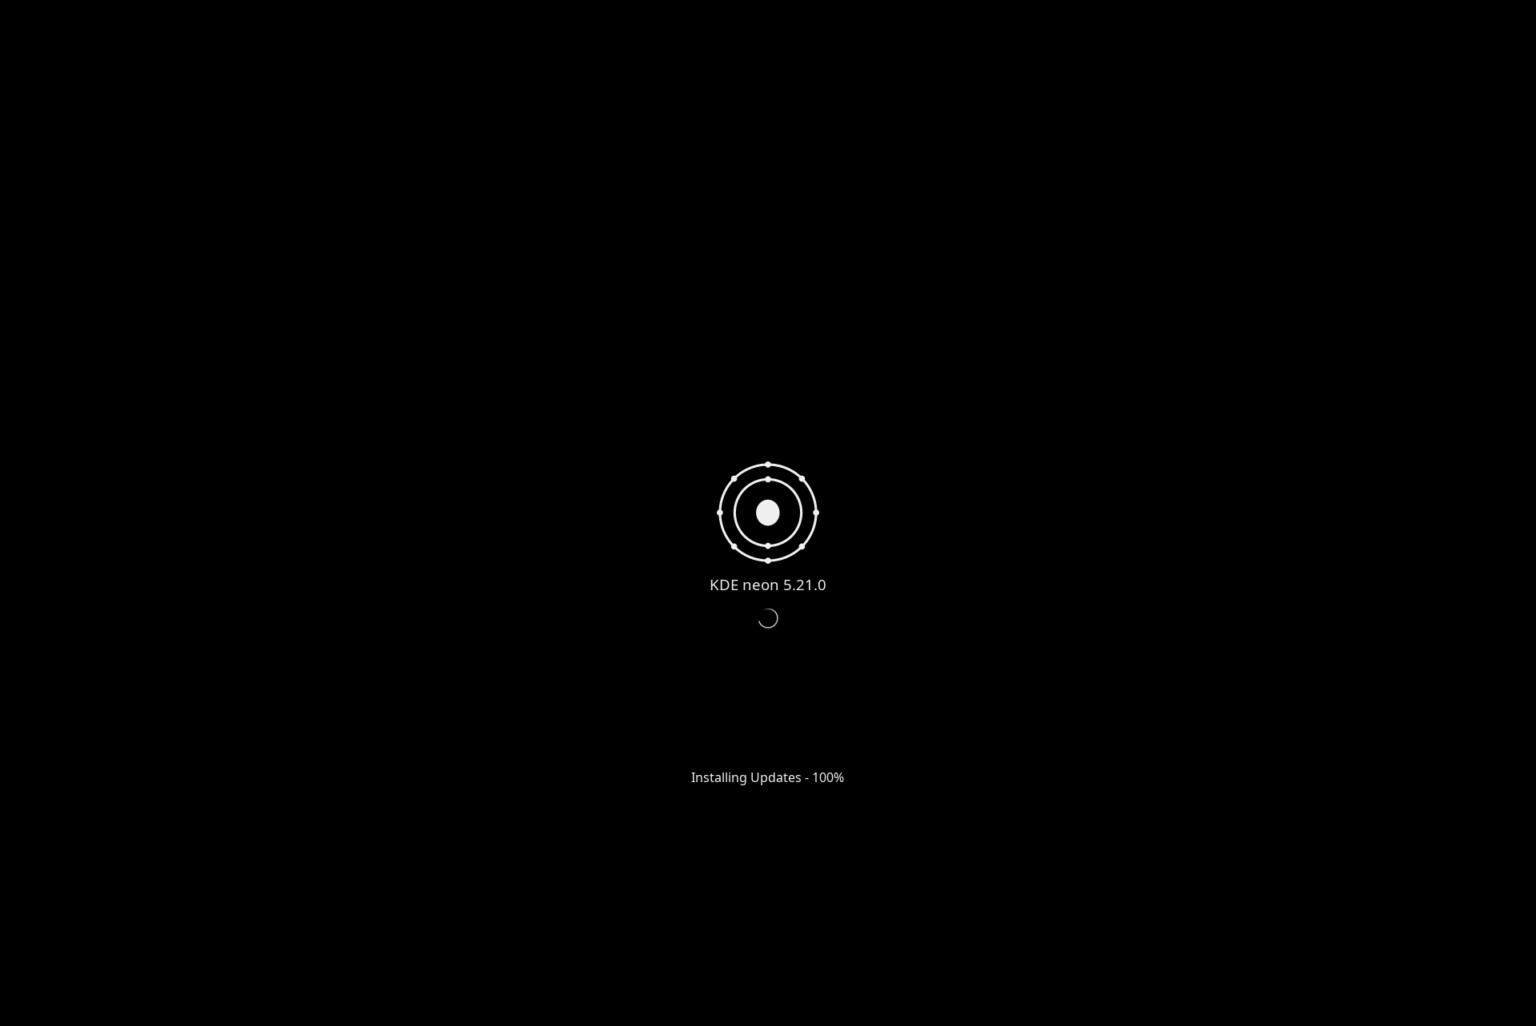 Blocking update